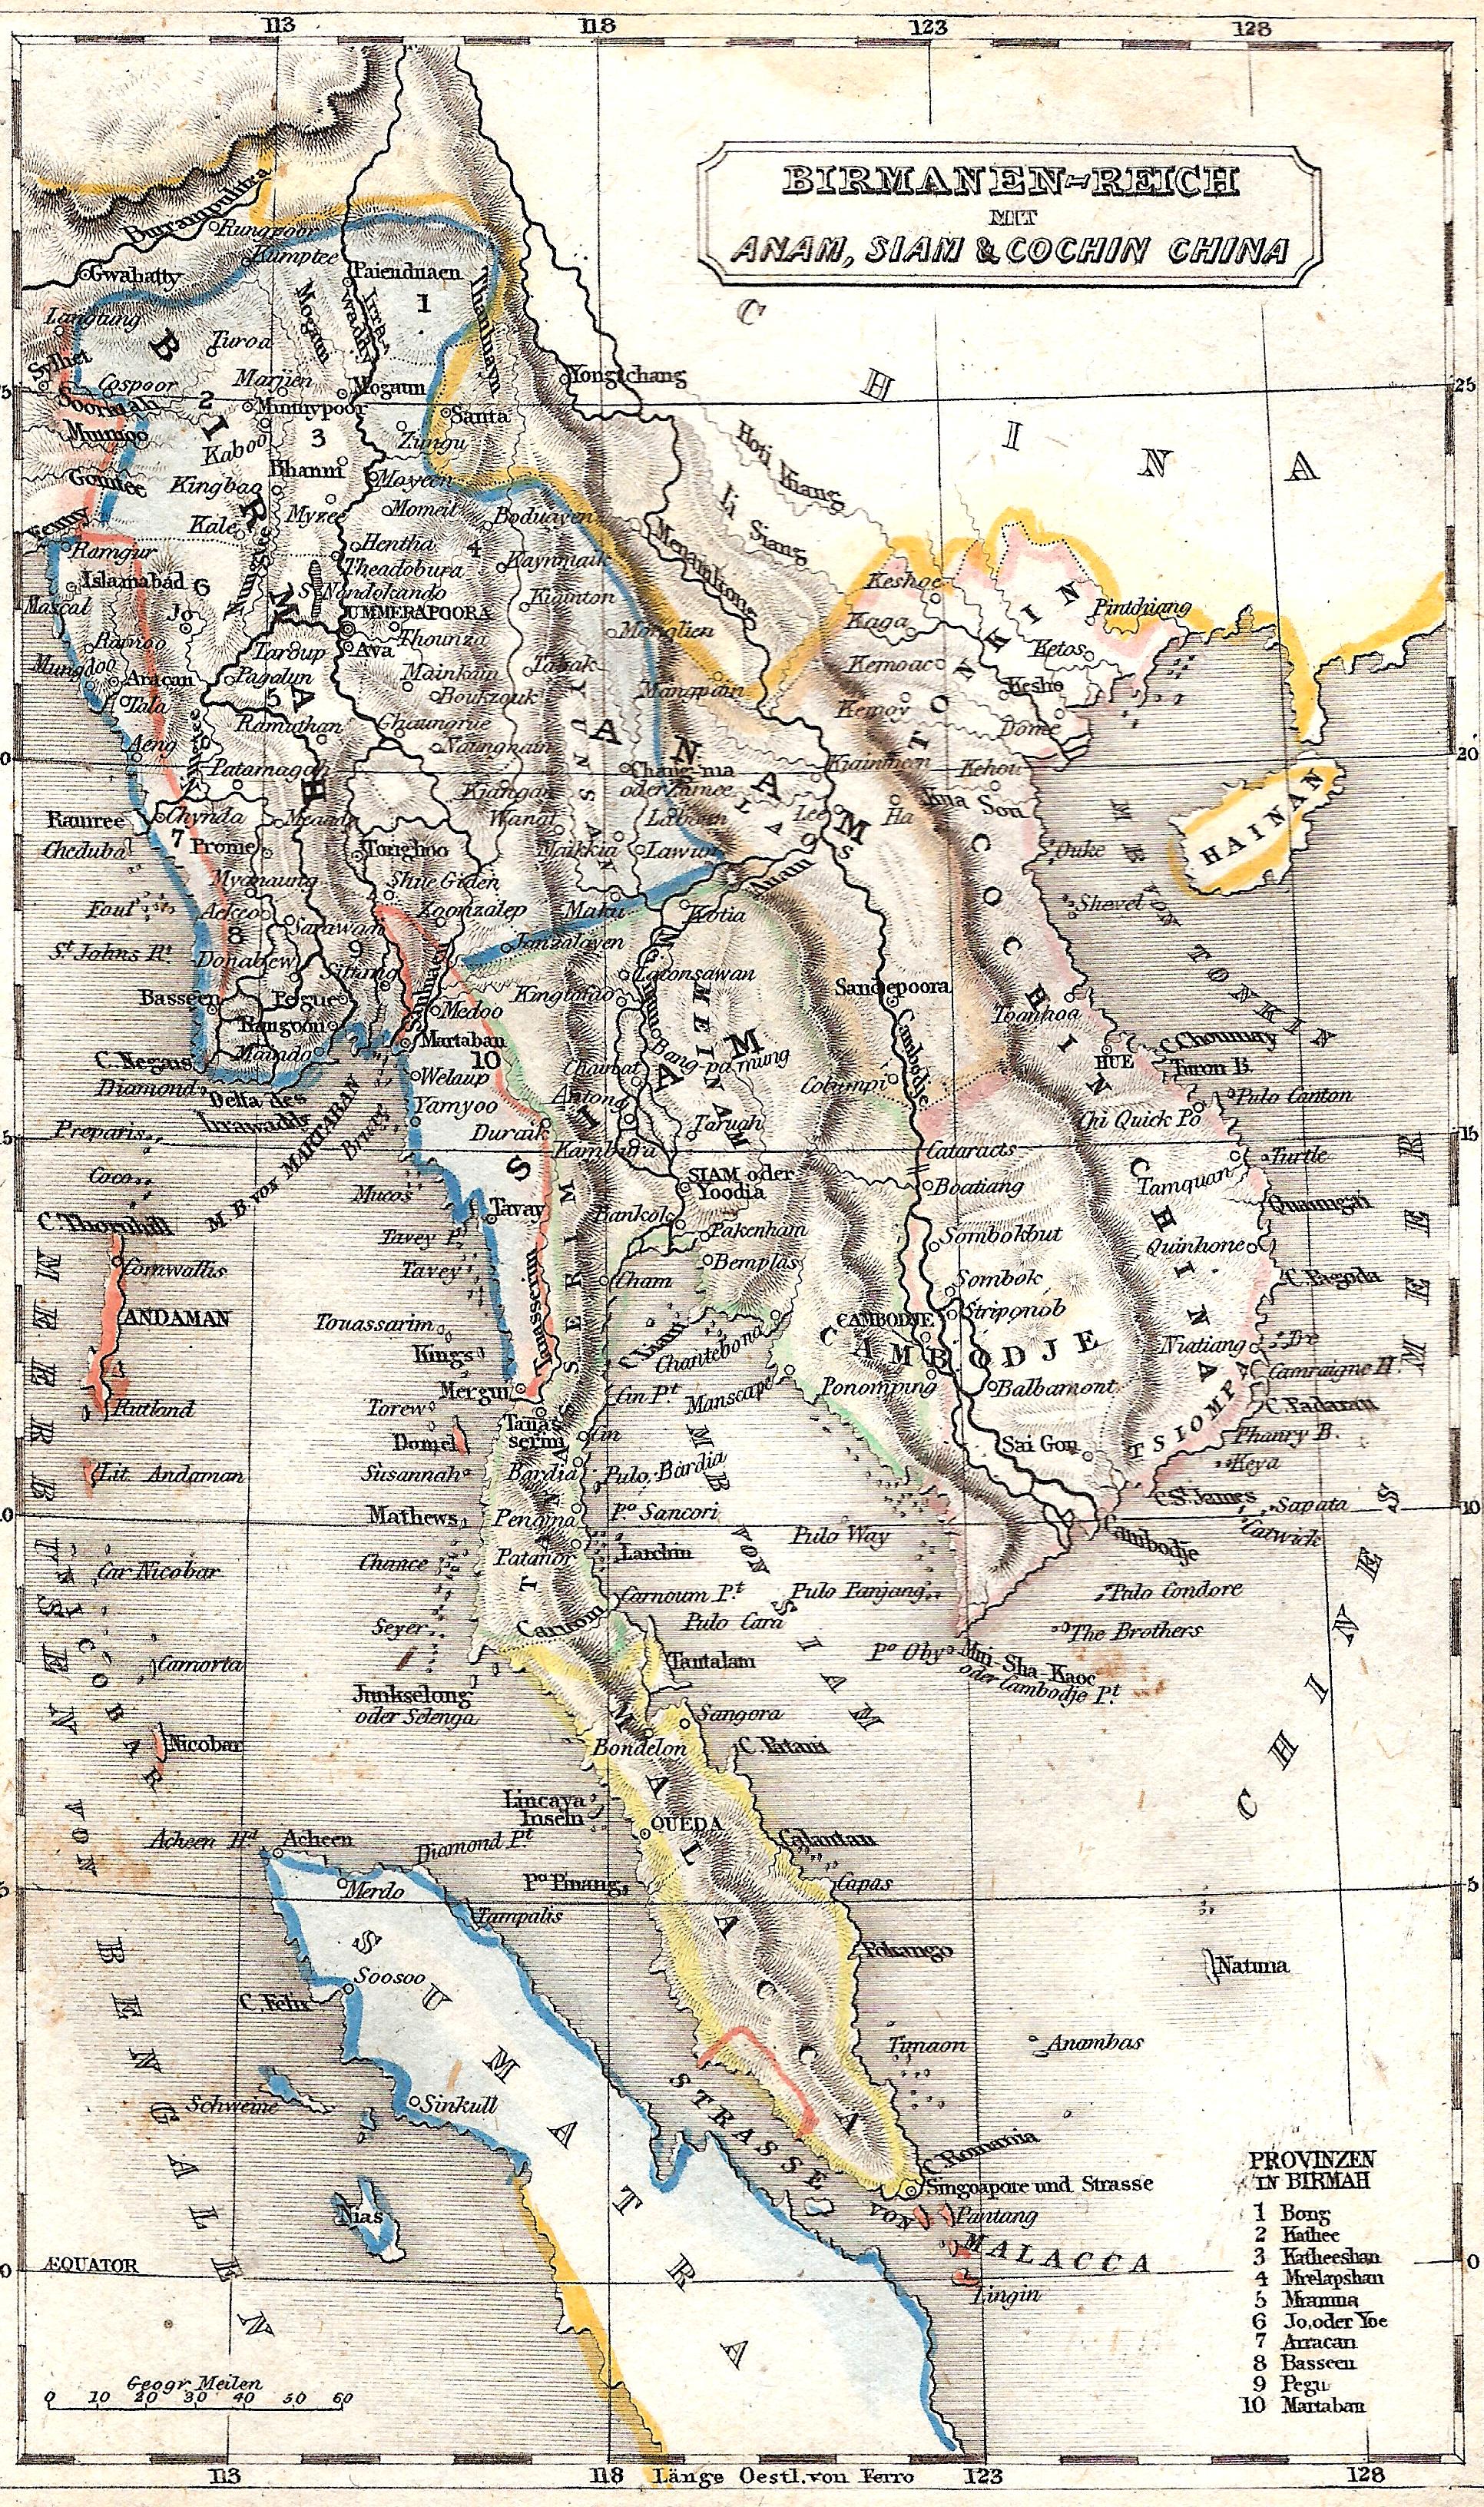 http://www.opiumgewichte.com/maps/Burma-Map-1836-8-MB.jpg